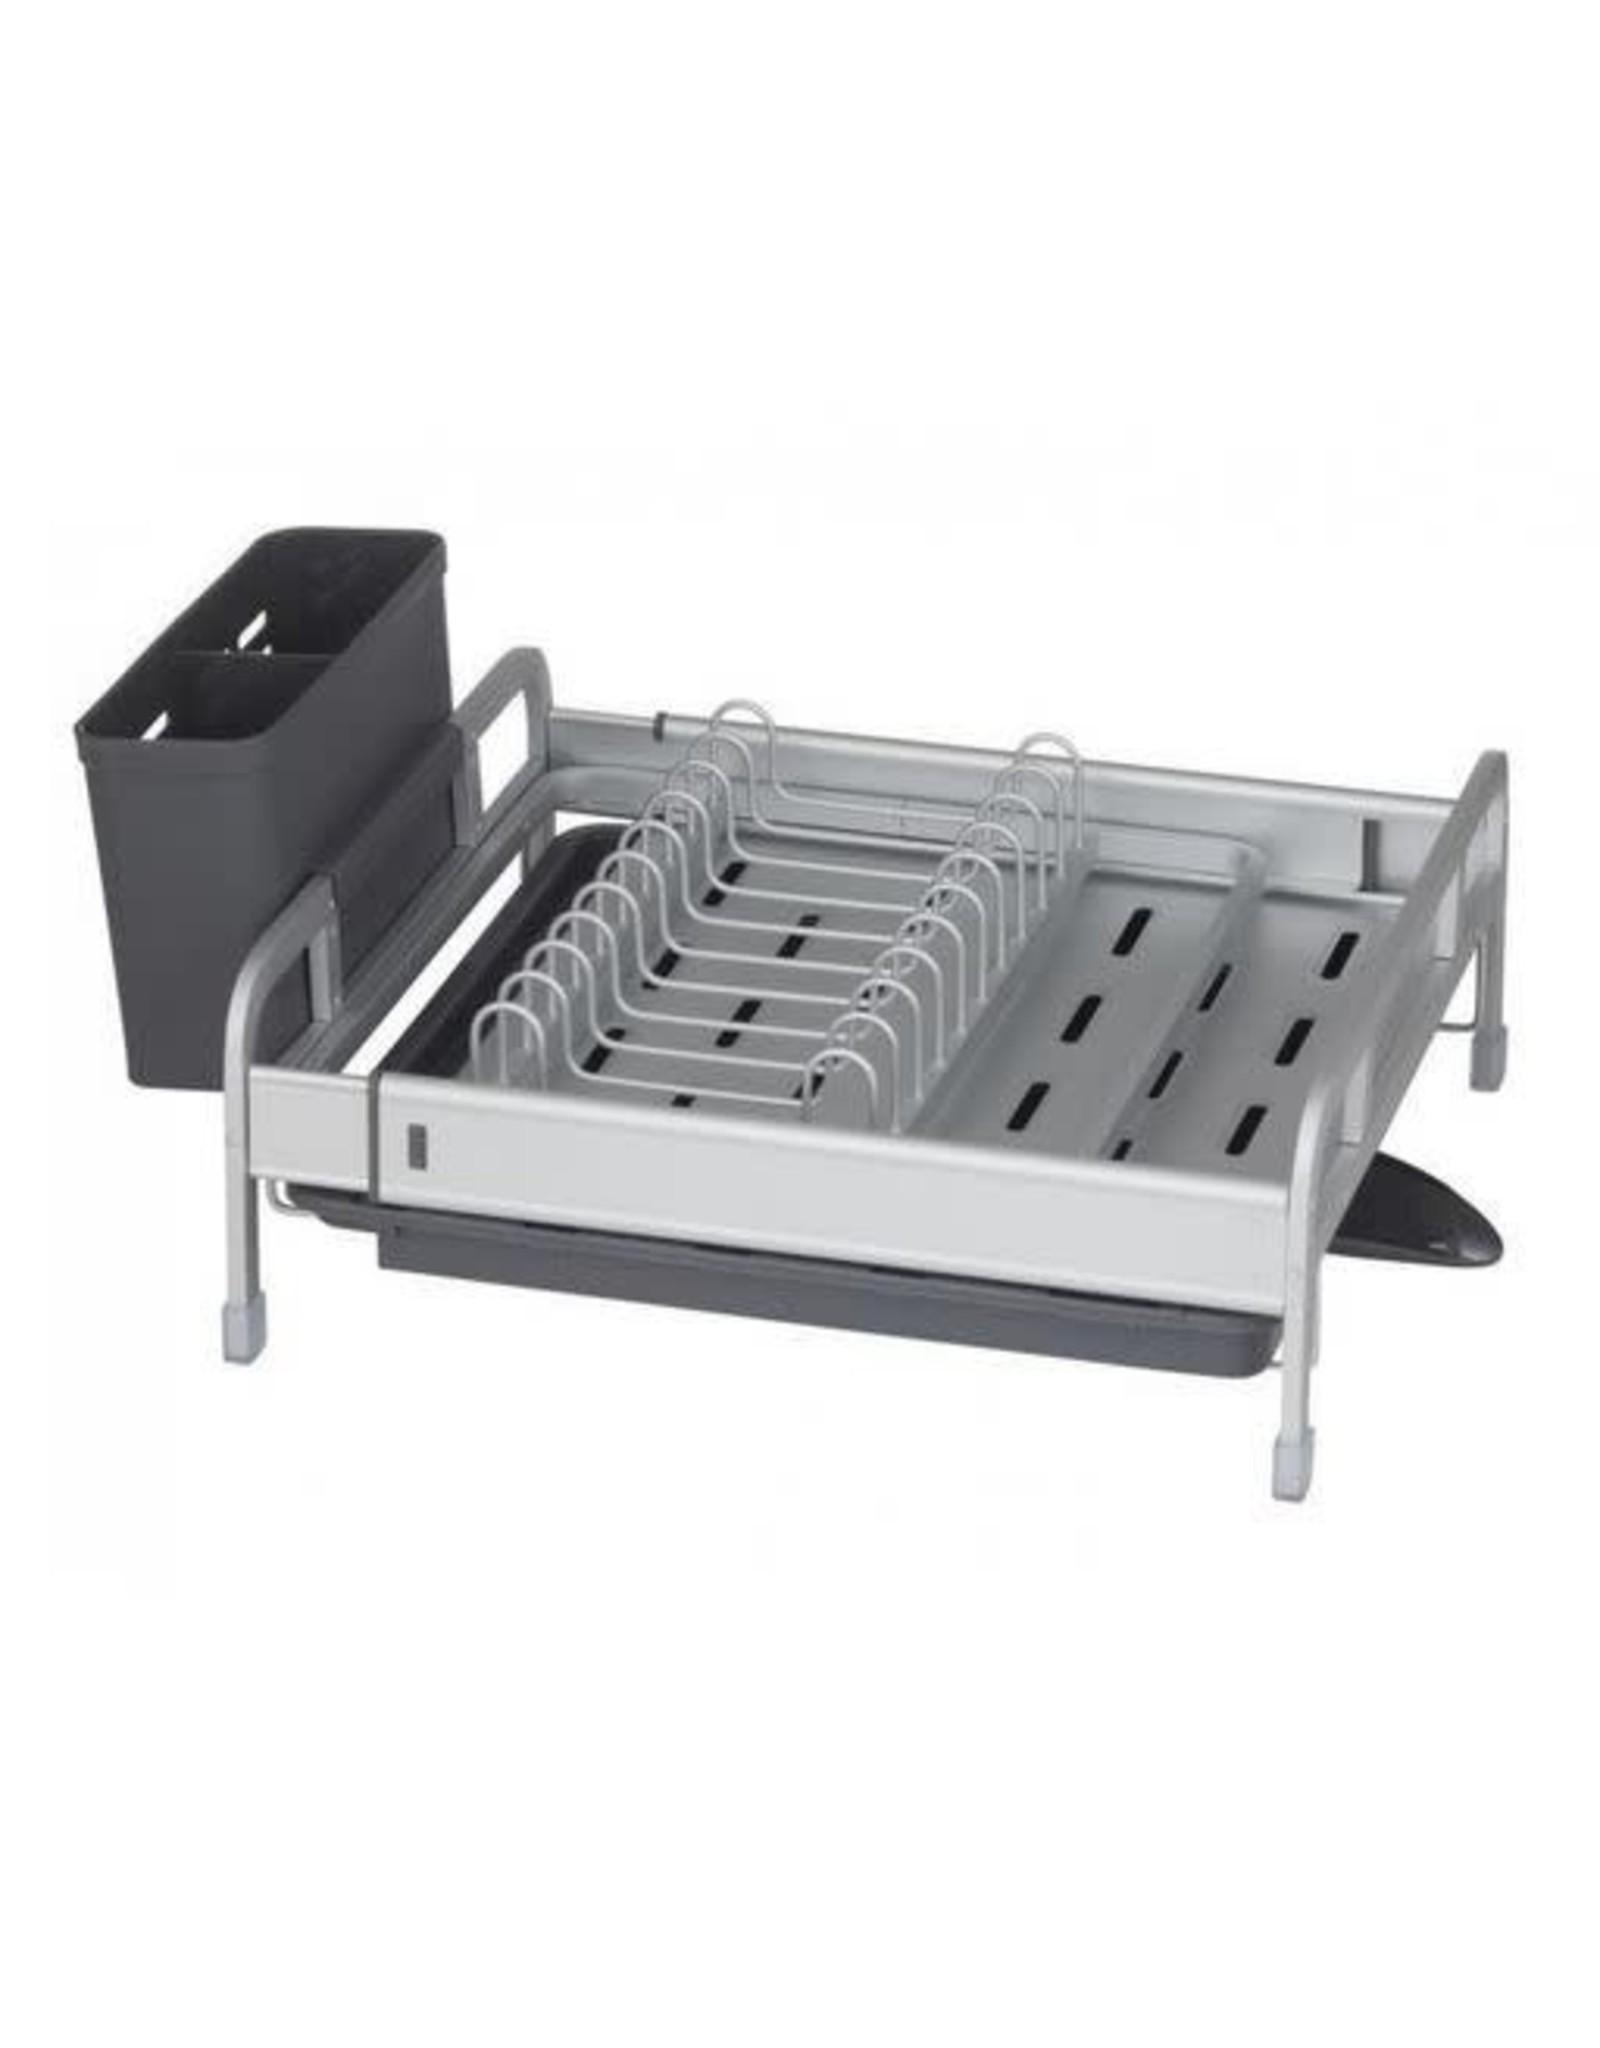 Davis & Waddell Remo Expandable Dish Rack